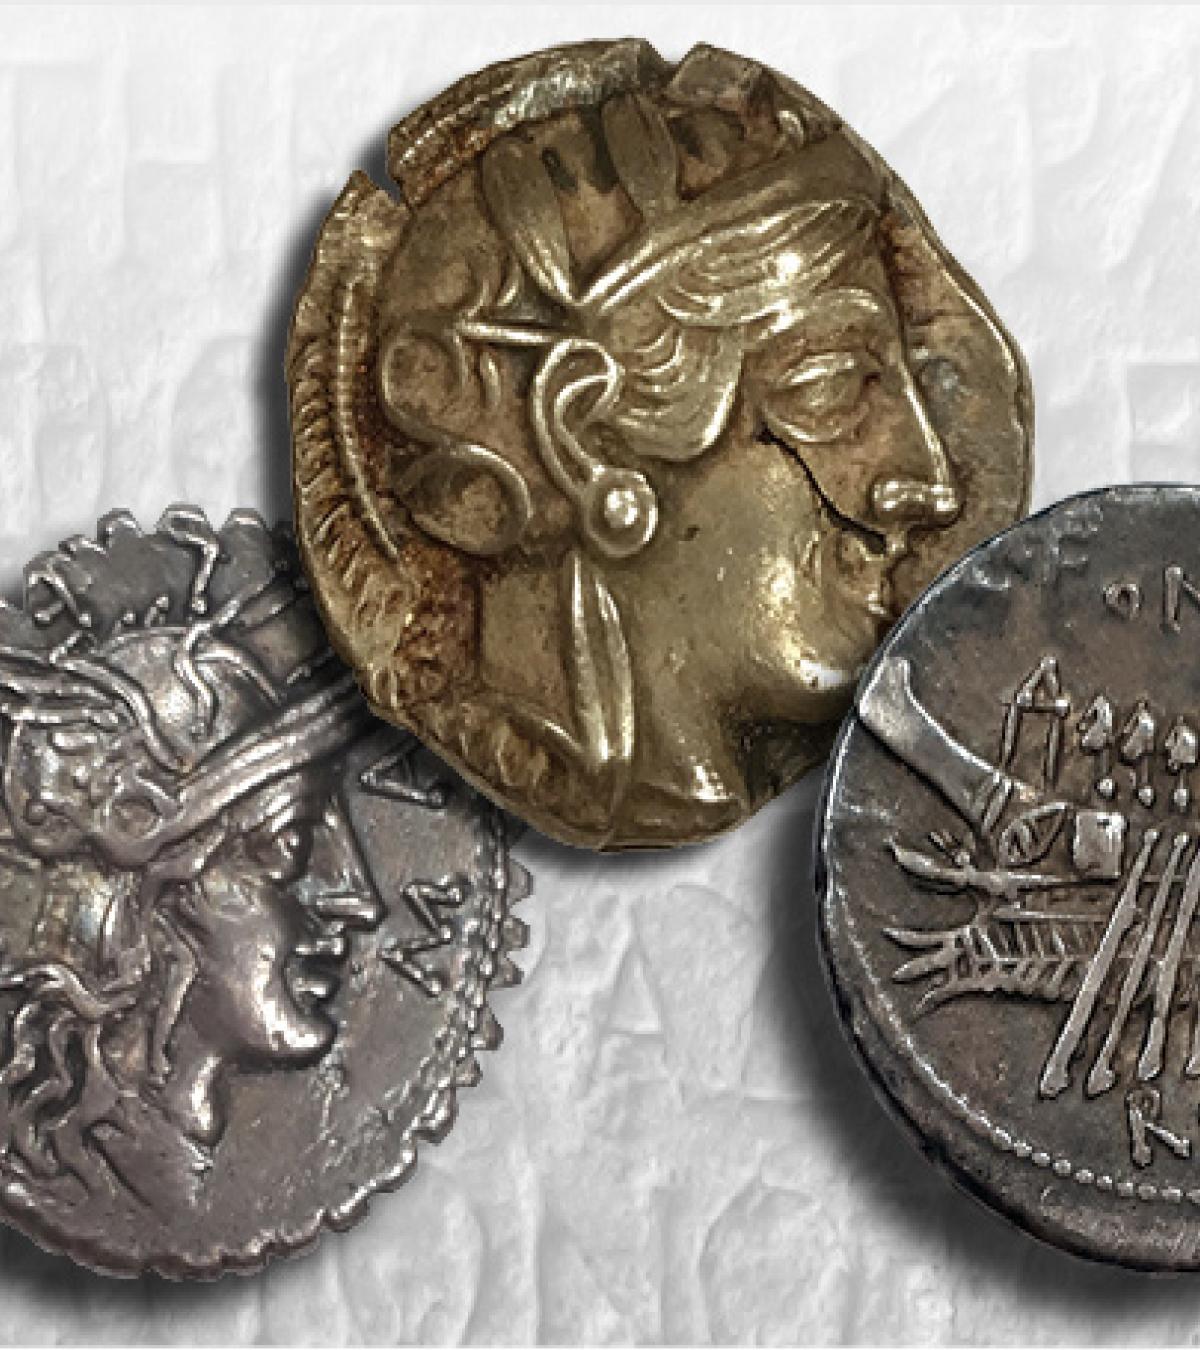 From left: Roman Republic silver Denarius of C. Poblicius Malleolus, 118 BCE, Purchase, 1946; Athenian silver tetradrachm, after 449 BCE. Gift of B.R. Brace, 1995; Roman Republic silver Denarius of C. Fonteius, 114 BCE. Gift of Dr. A.G. McKay, 2004